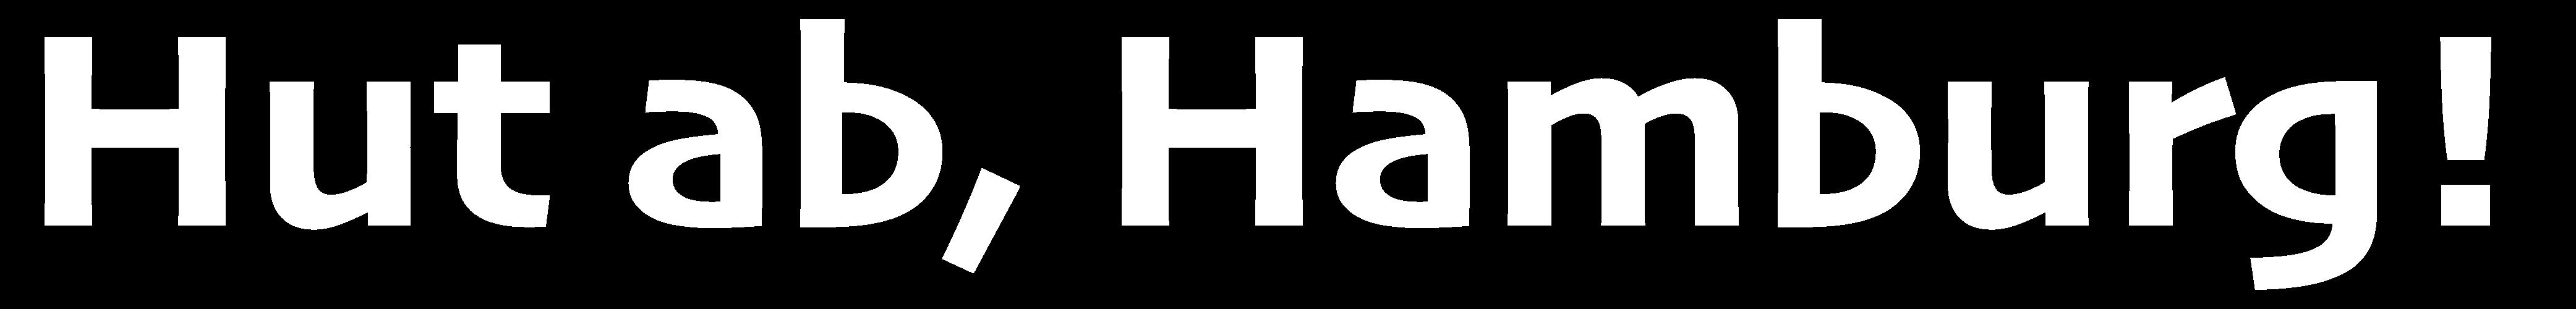 Hut ab, Hamburg!